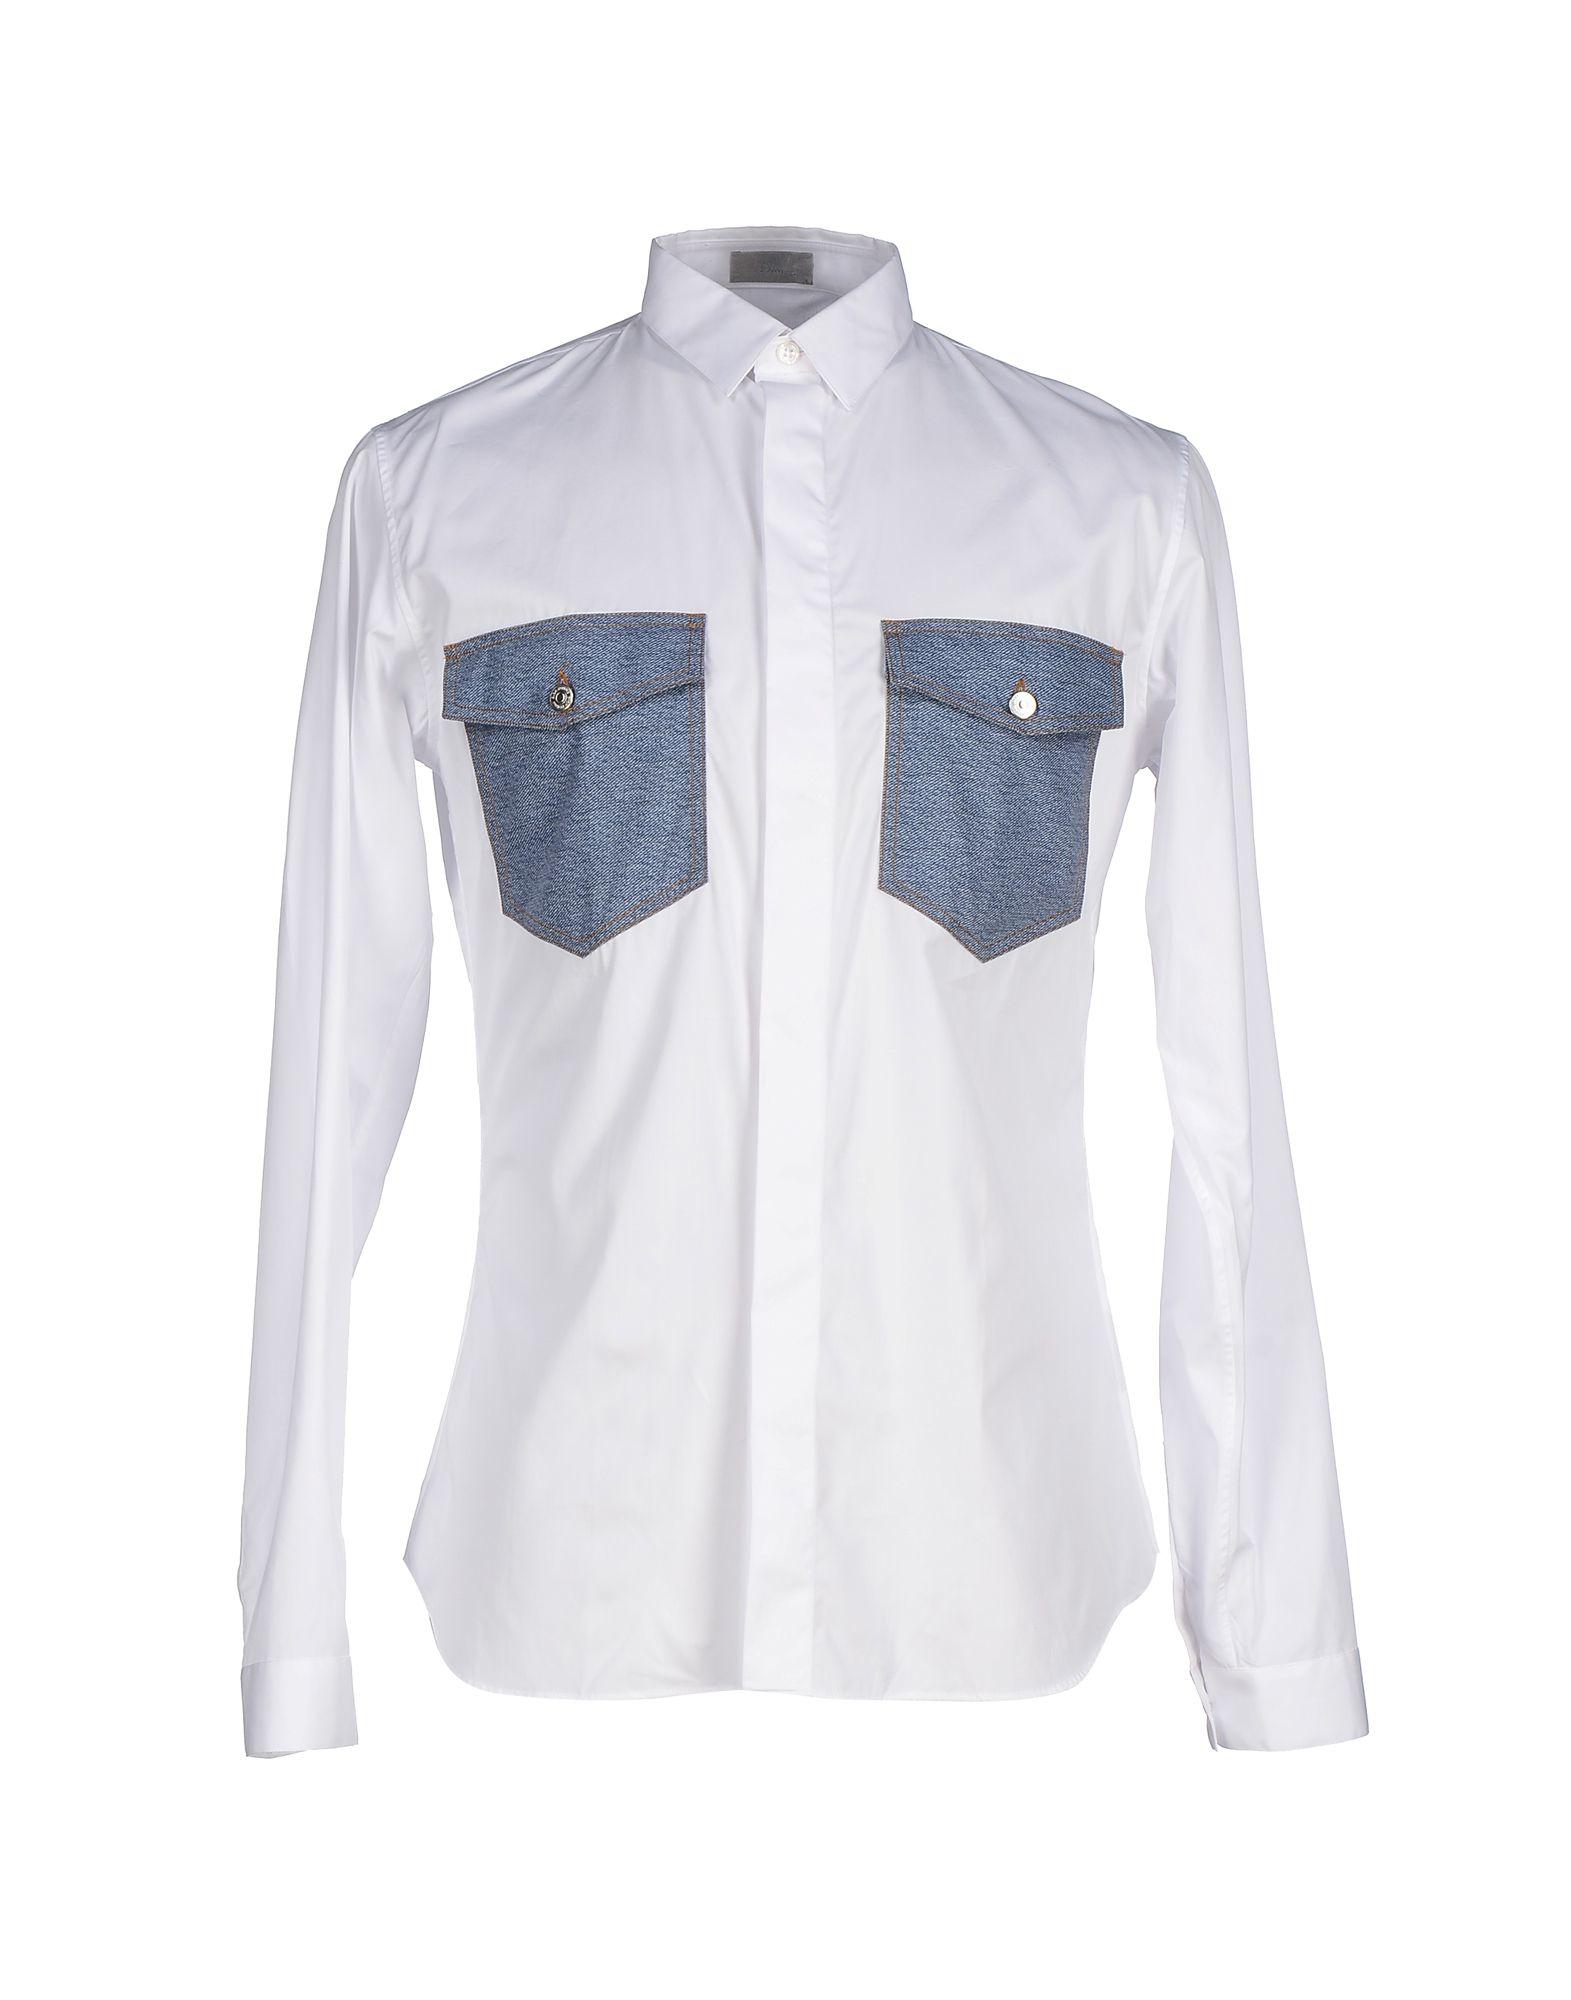 97a26514 Dior Shirt | The Art of Mike Mignola